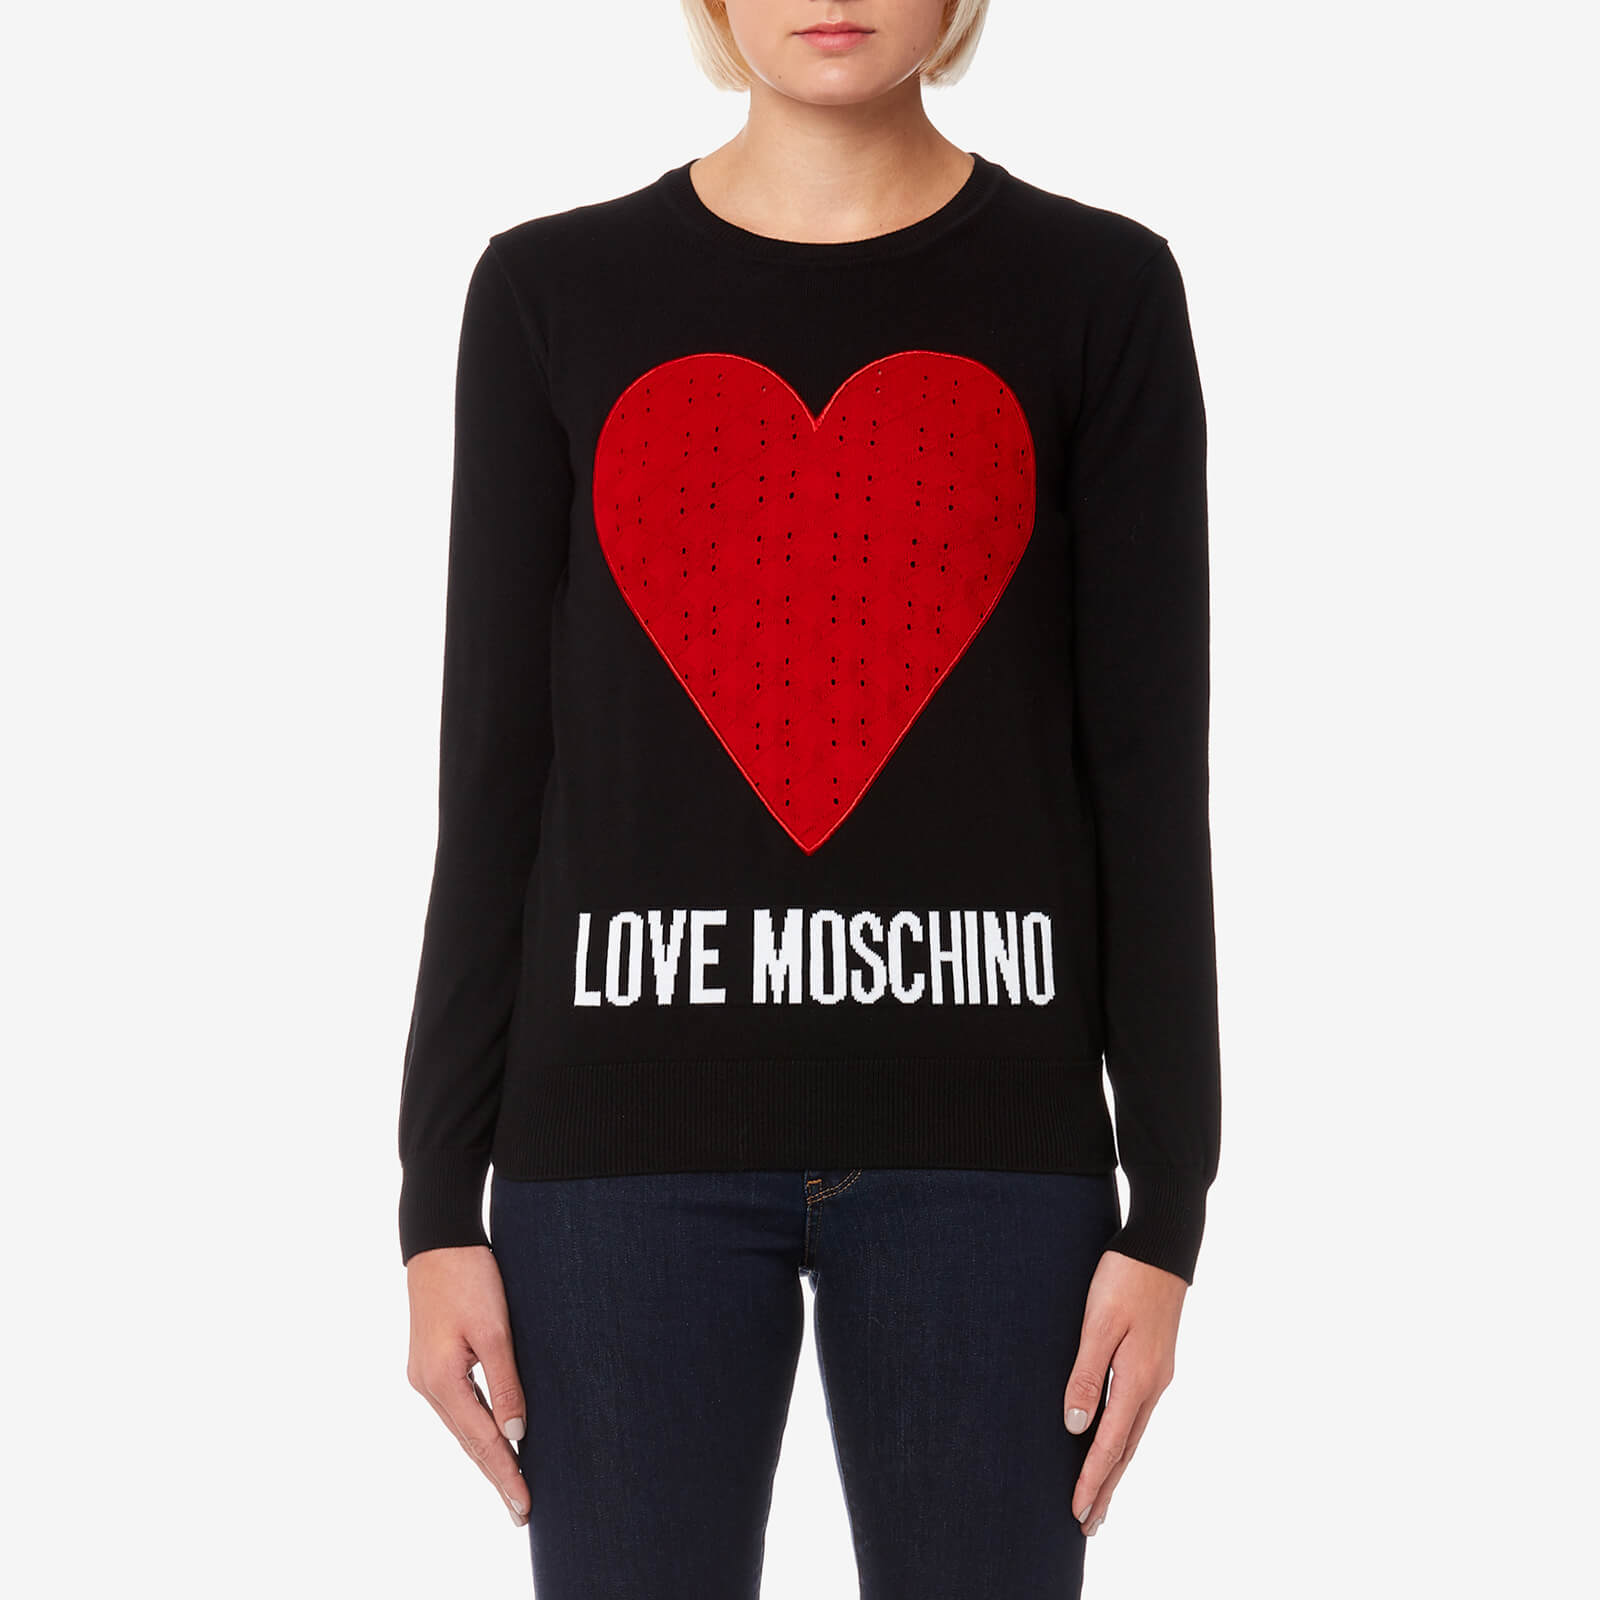 22201cf2478d8 Love Moschino Women's Heart Logo Jumper - Black Womens Clothing   TheHut.com